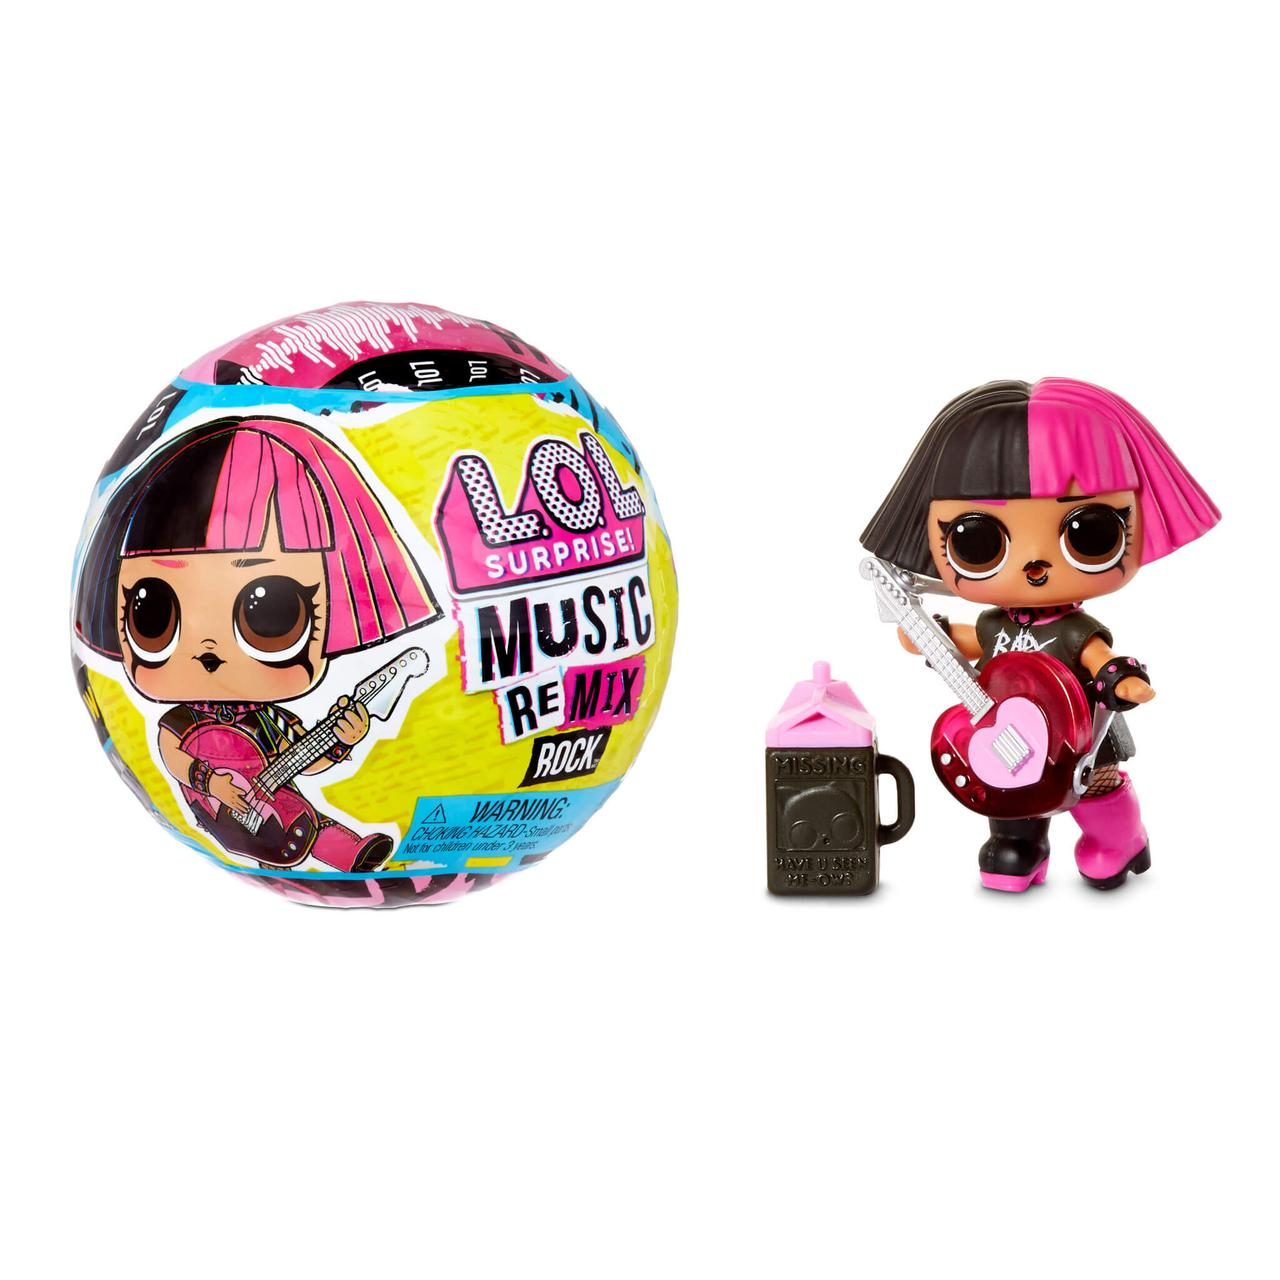 LOL Surprise Кукла ЛОЛ Ремикс Рок в шарике, Remix Rocki Оригинал